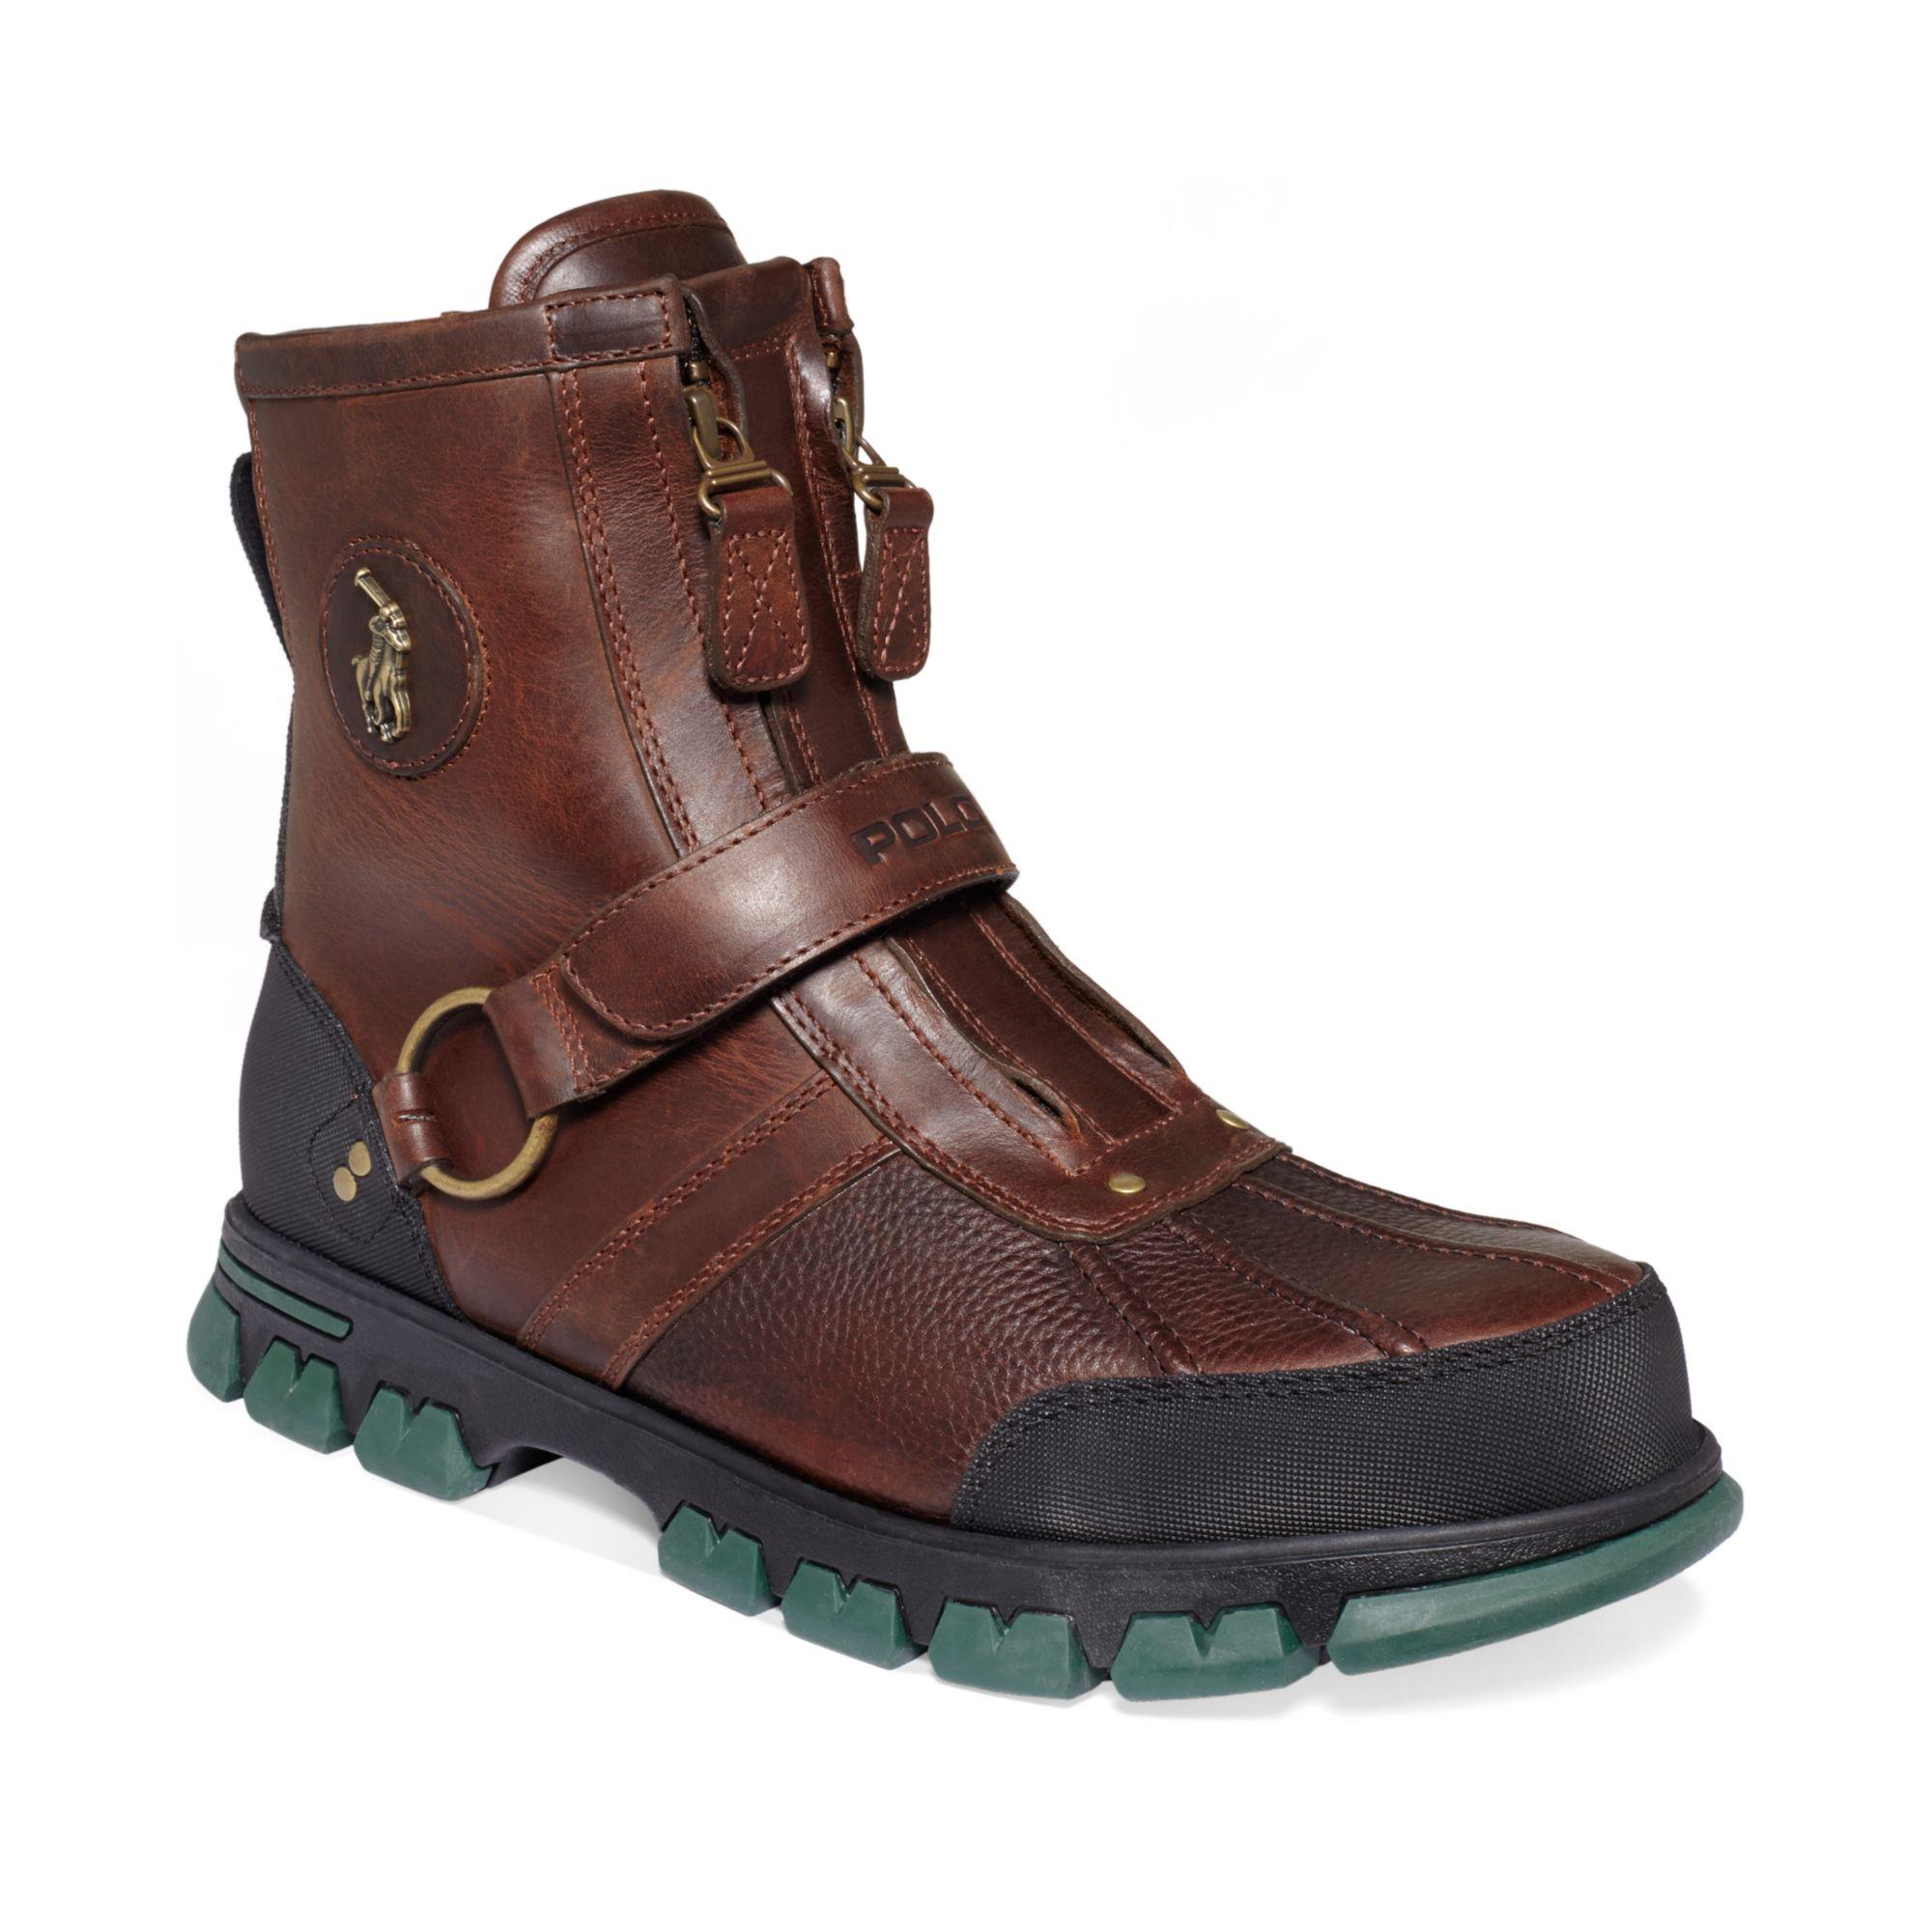 ralph lauren conquest iii highc boots in brown for men. Black Bedroom Furniture Sets. Home Design Ideas